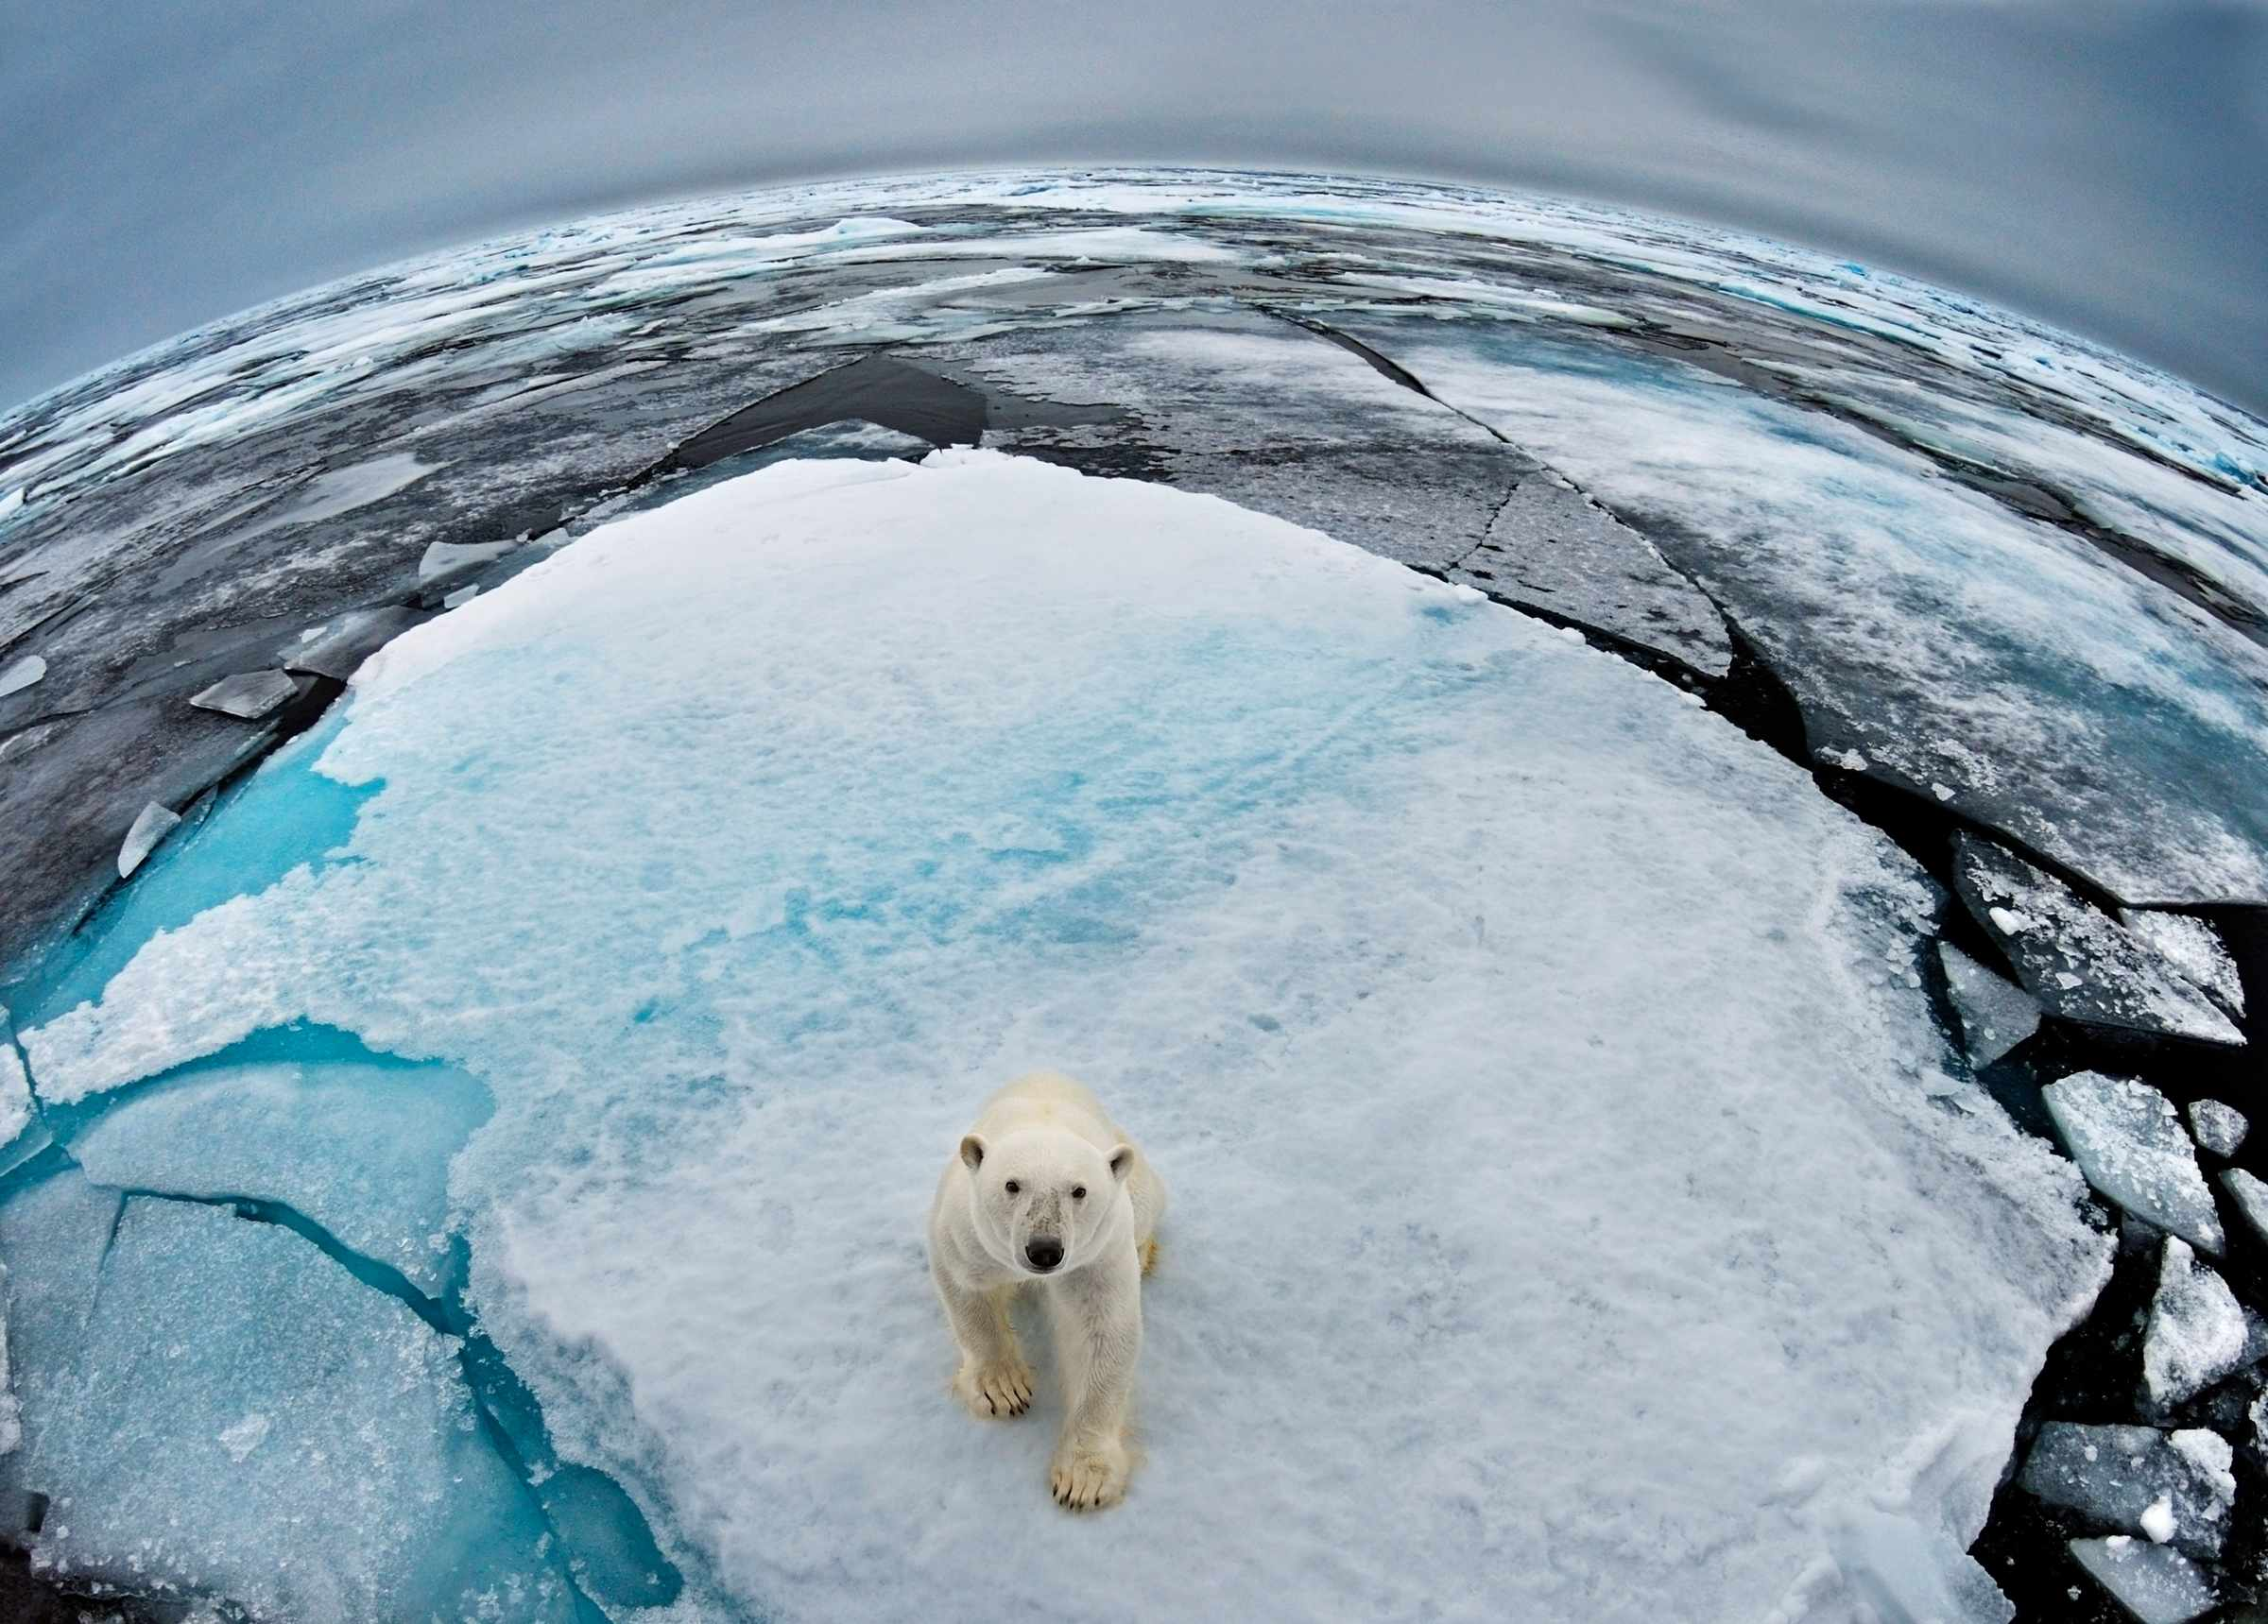 Polar bear in Svalbard, Norway. © WWF